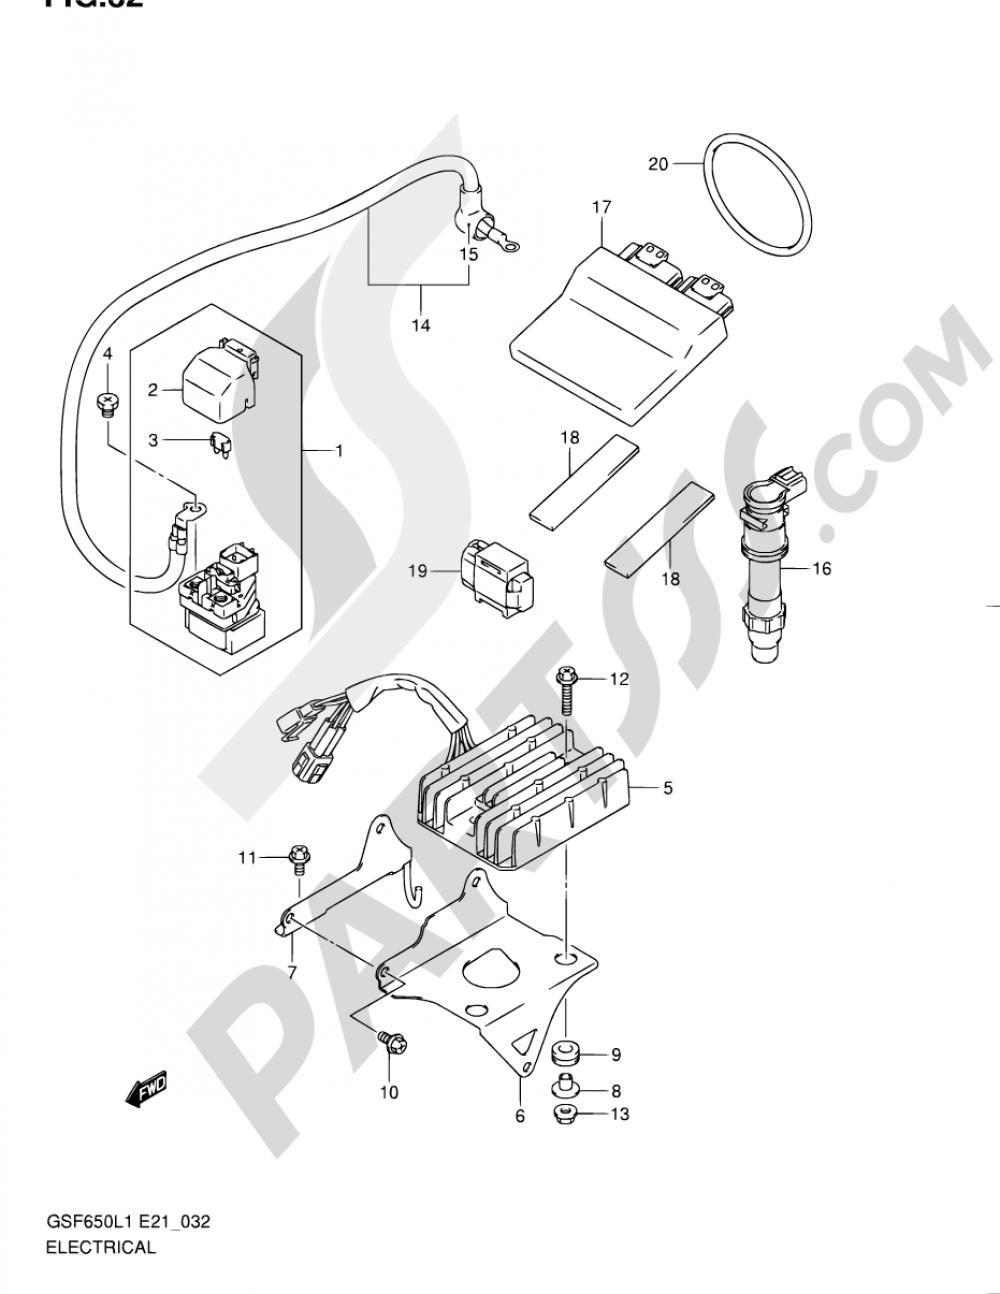 32 - ELECTRICAL (GSF650SAL1 E21) Suzuki BANDIT GSF650 2011